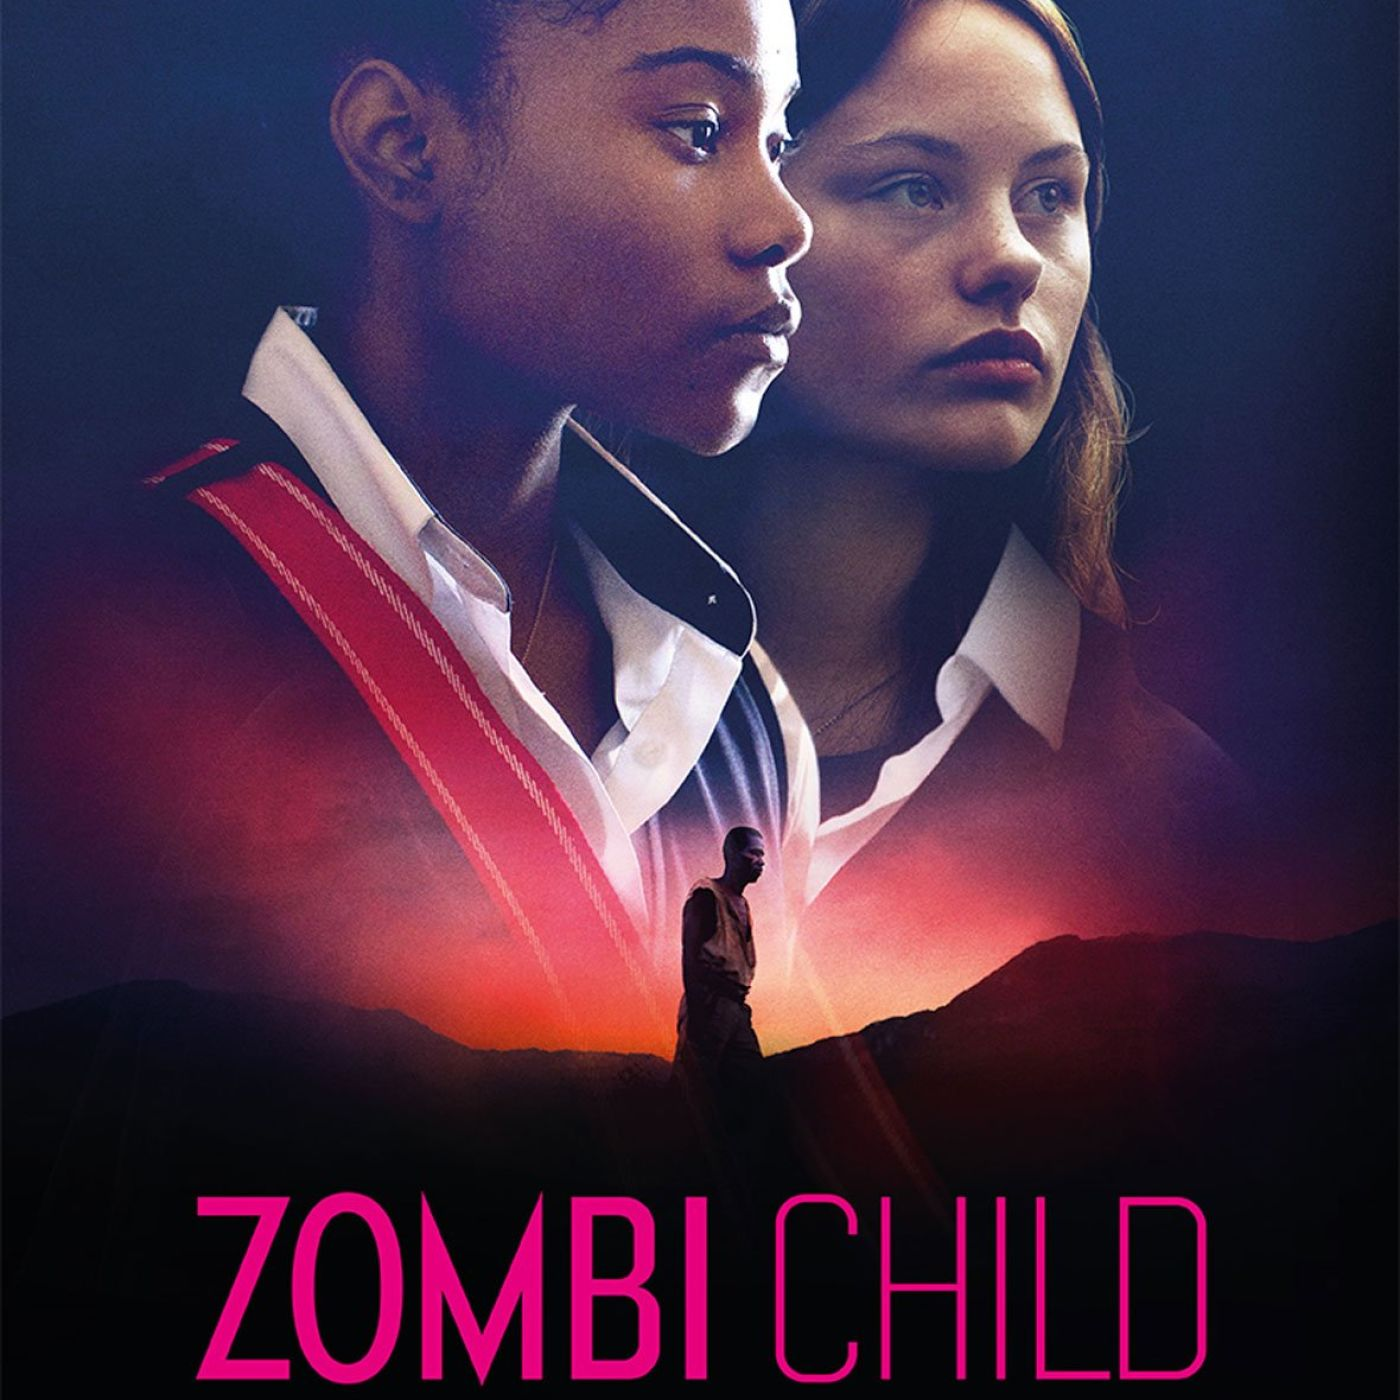 Critique du Film Zombi Child de Bertrand Bonello